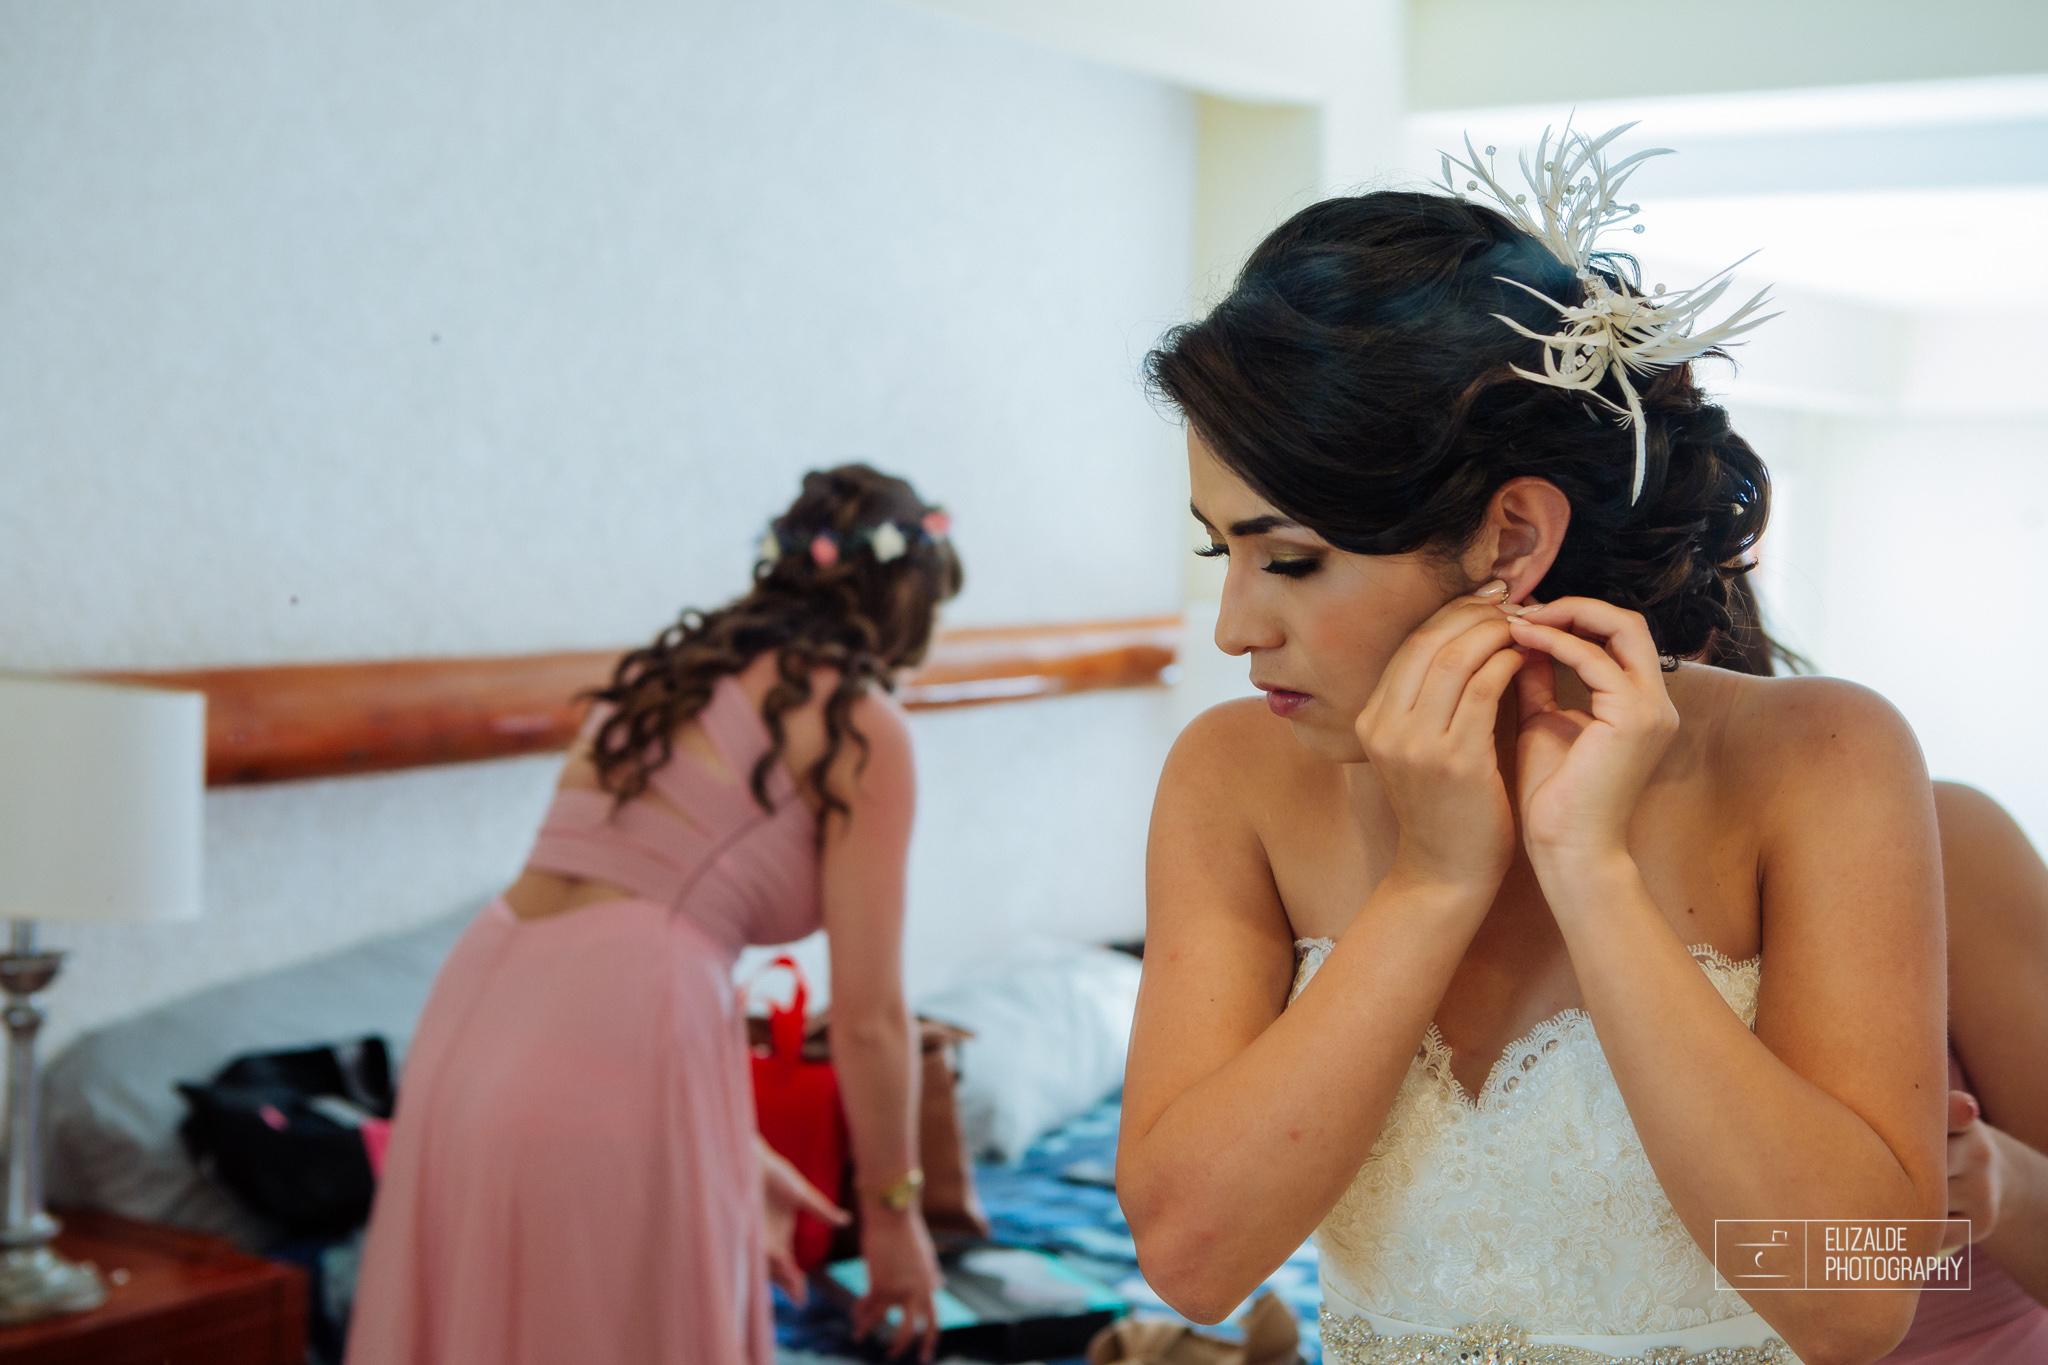 Pay and Ferran_Acapulco_Destination Wedding_Elizalde Photography-43.jpg